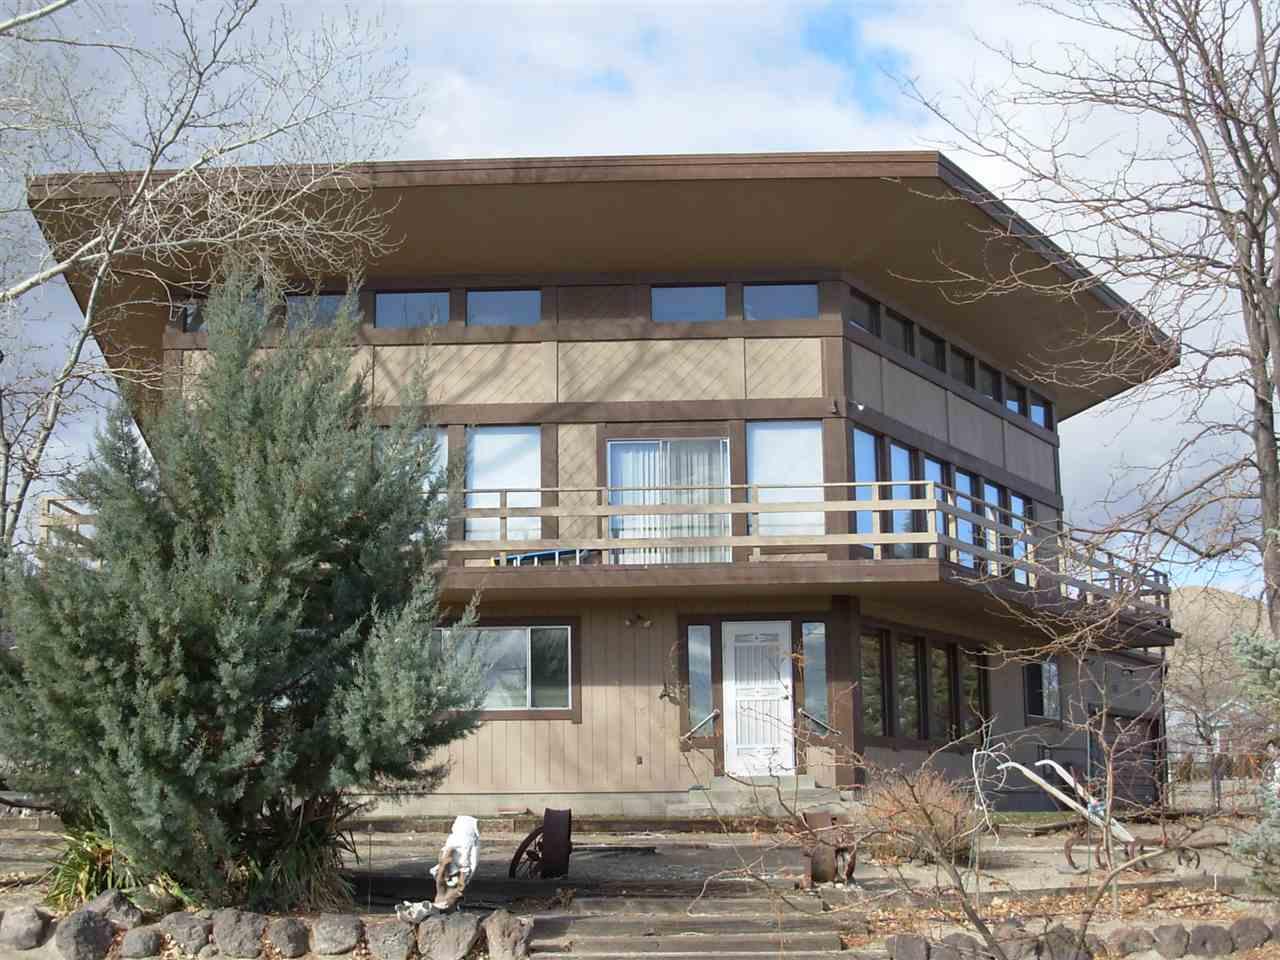 13 Shelter Hills Dr, Yerington, NV